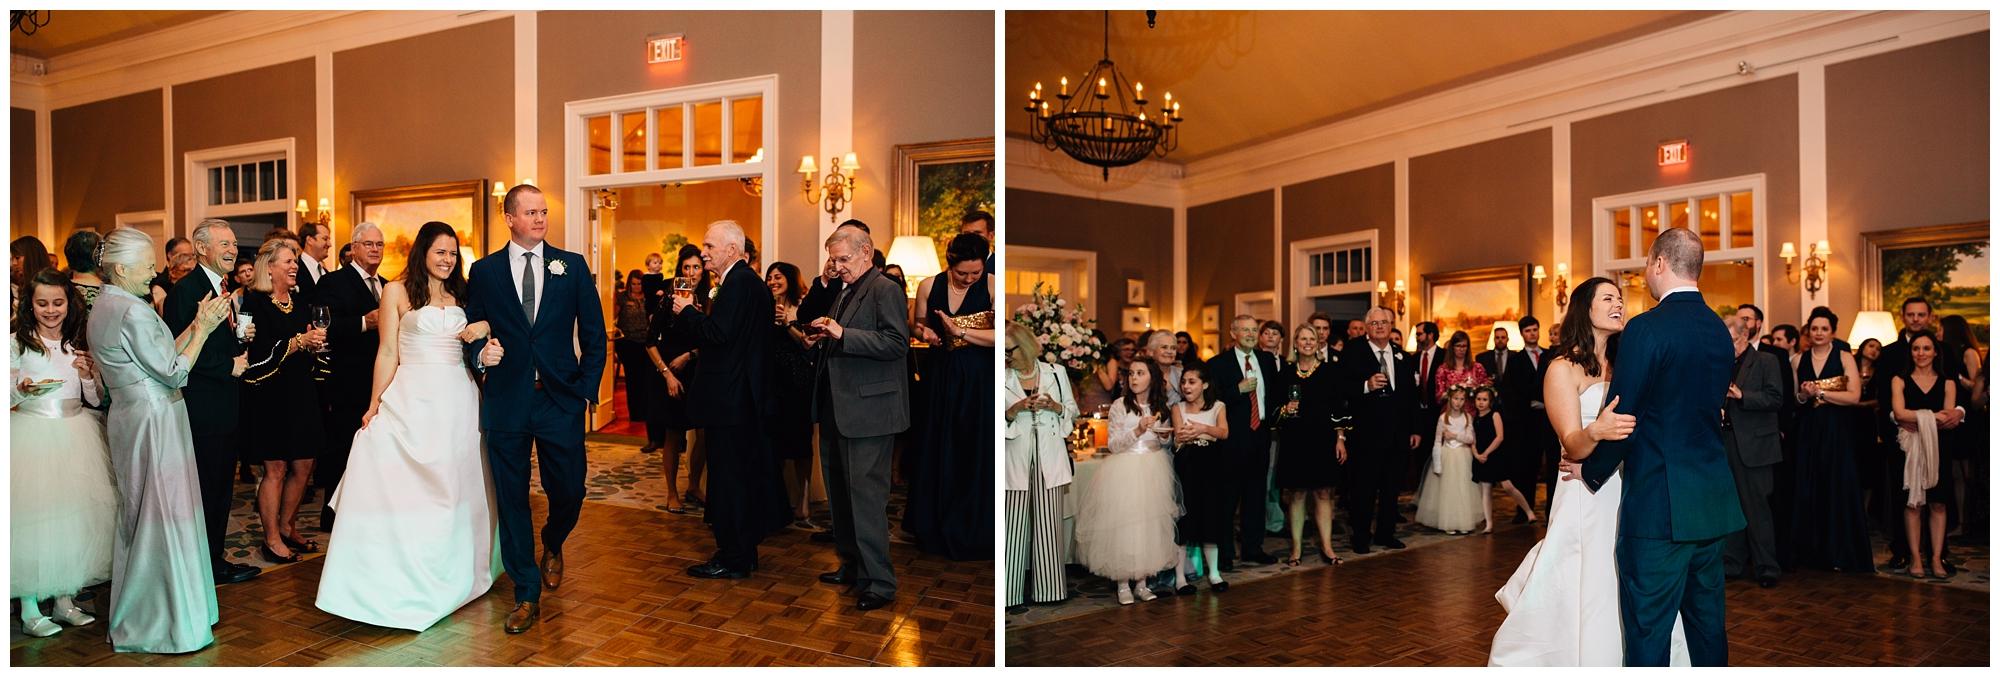 Country-Club-Virginia-Wedding-77.jpg